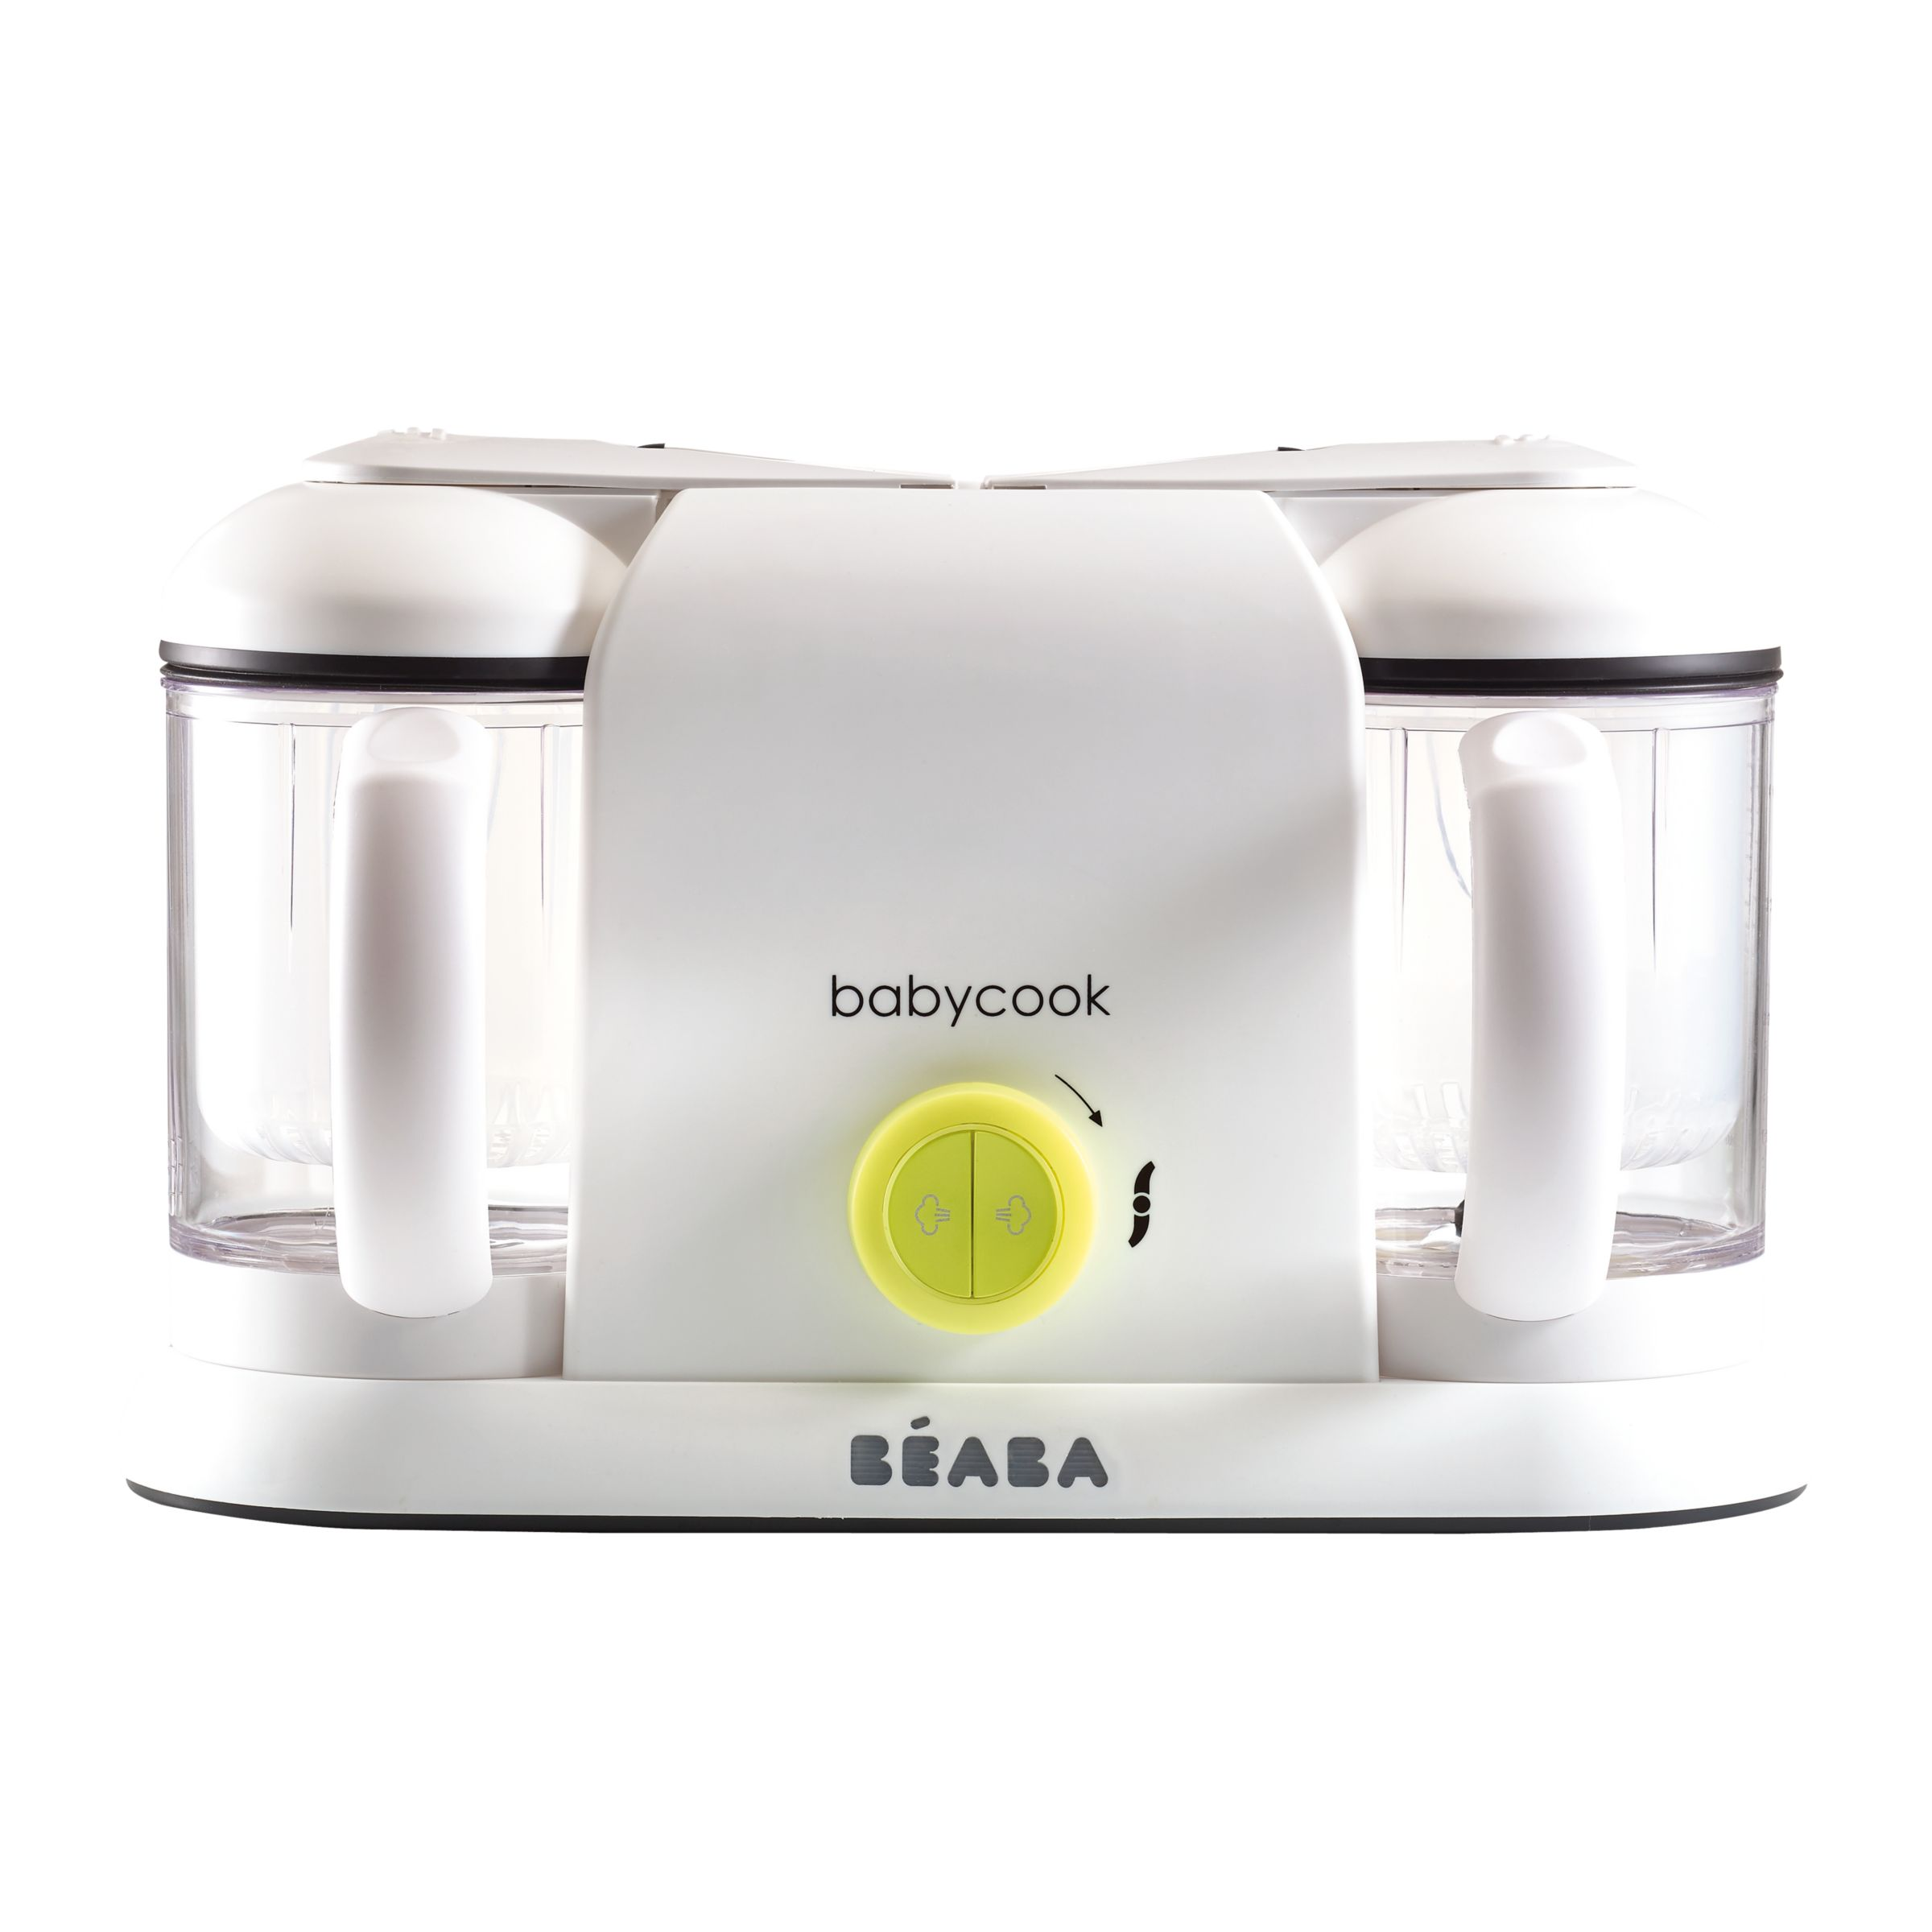 Beaba Beaba Babycook Plus Neon Food Processor, White